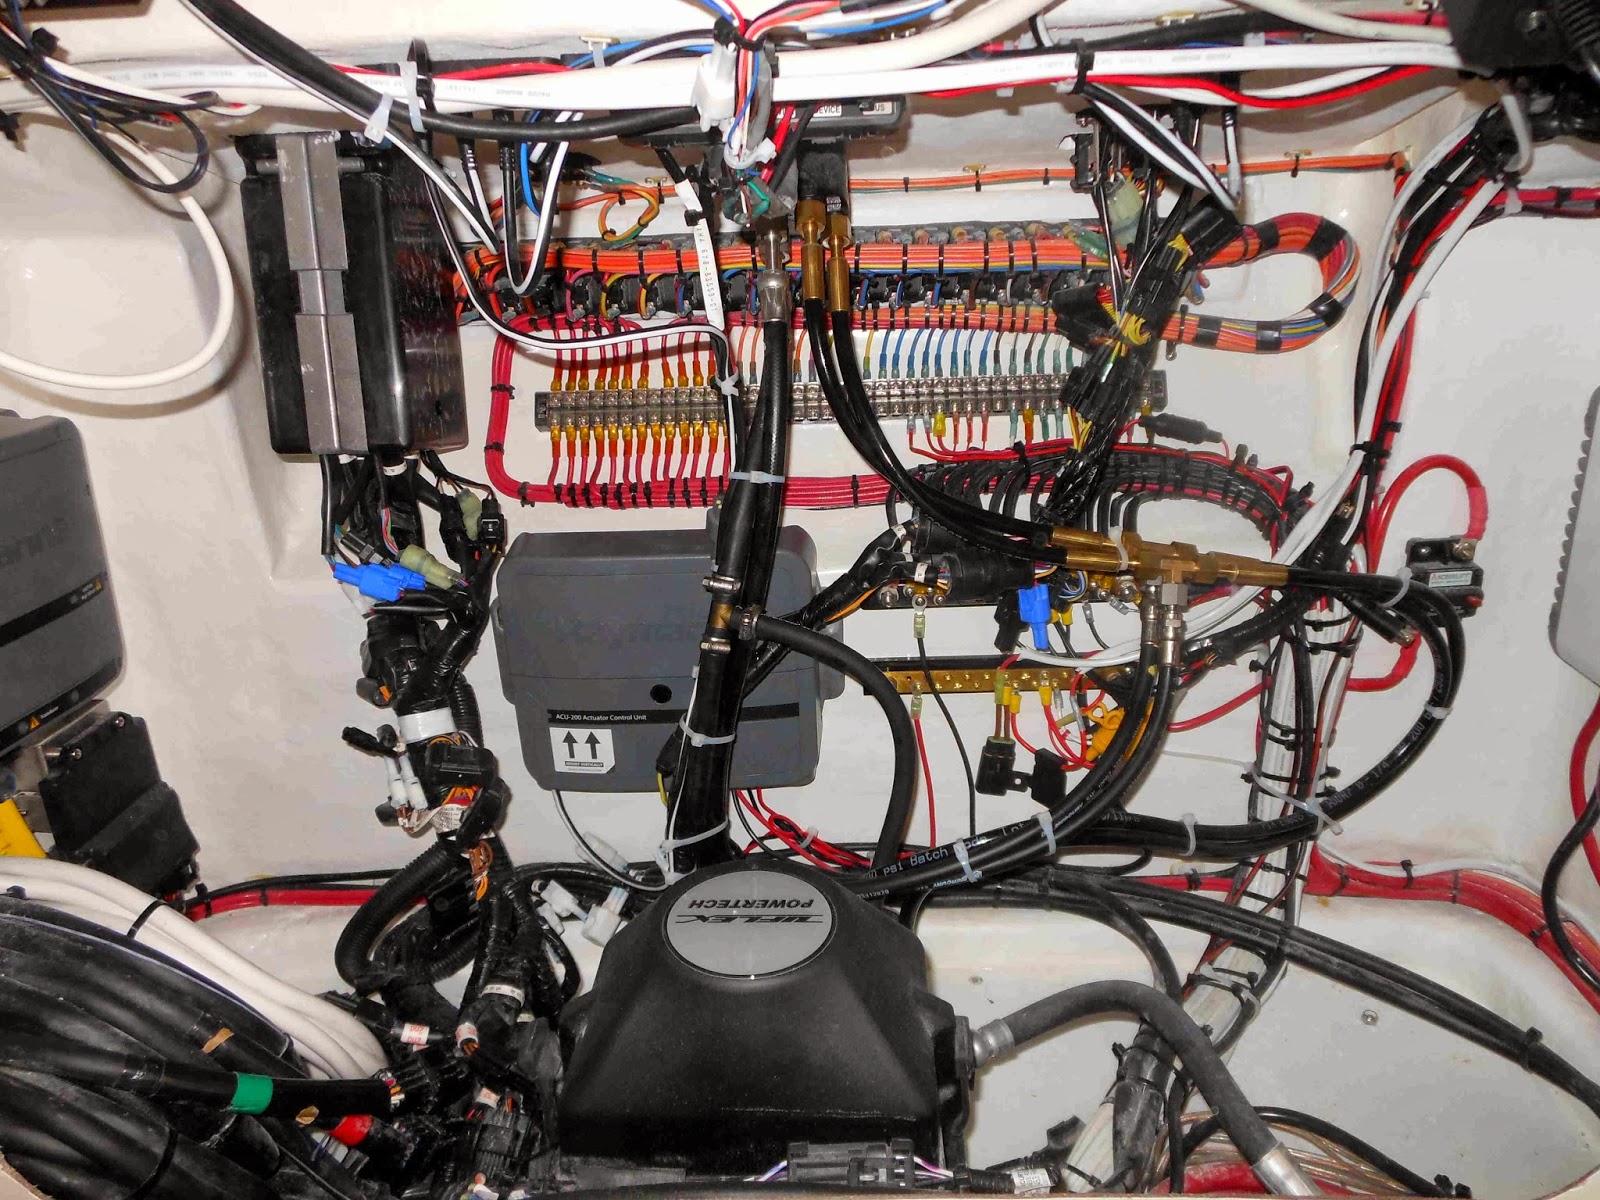 boat wiring job suw ihero store u2022 rh suw ihero store boat wiring harness adapter boat wiring harness adapter [ 1600 x 1200 Pixel ]